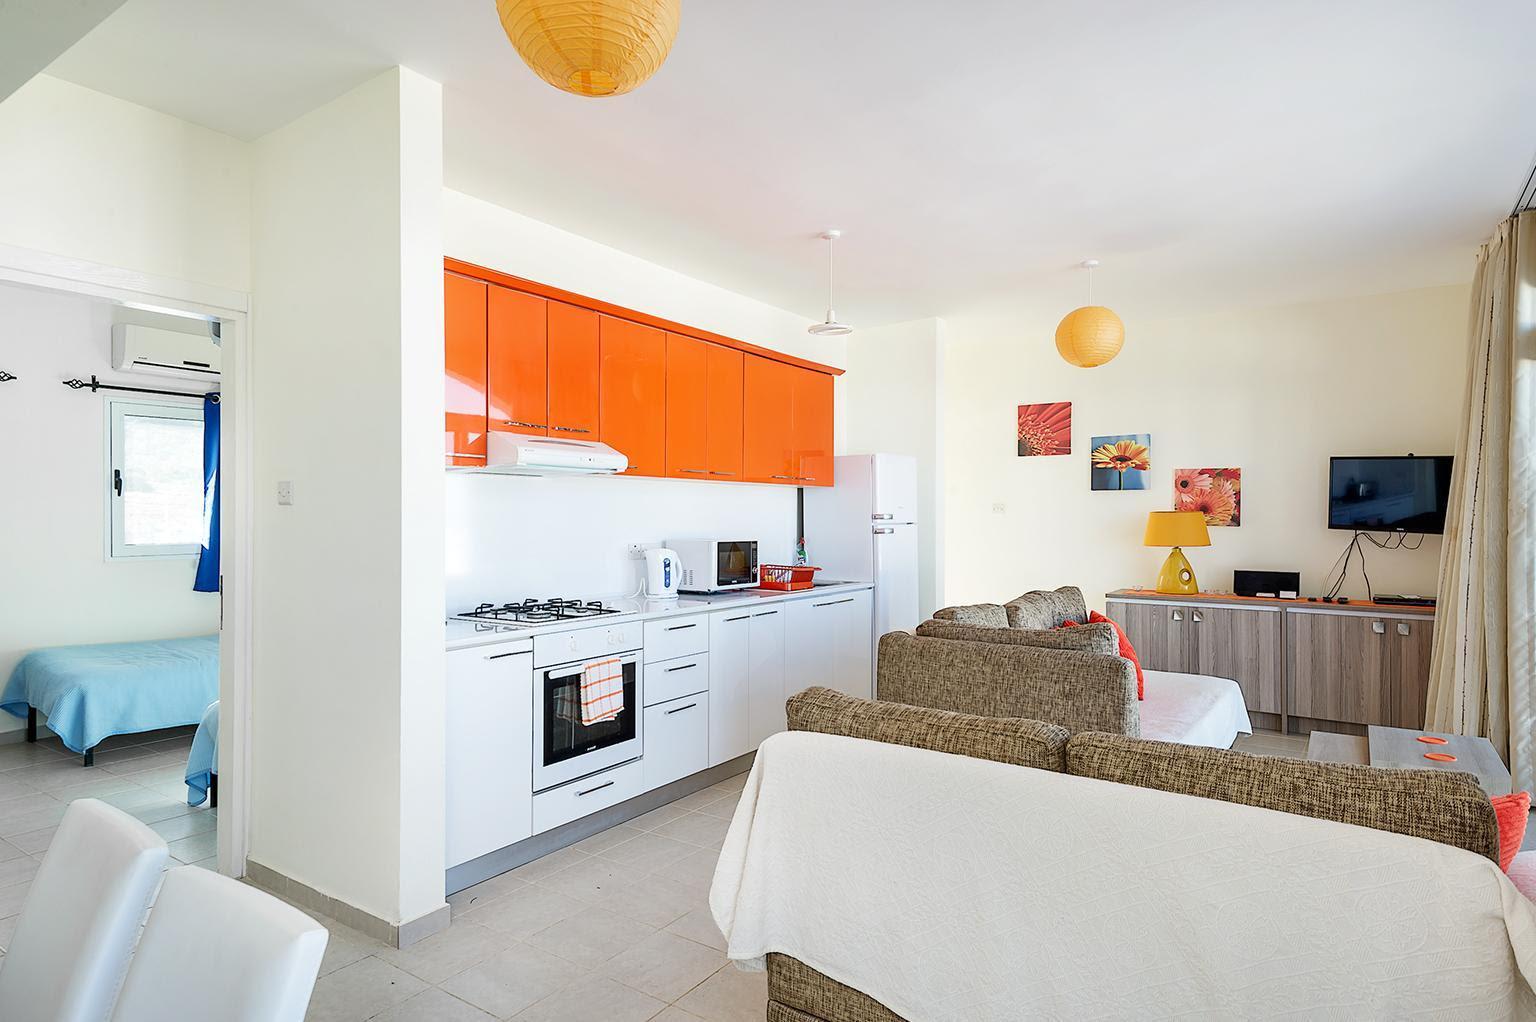 Joya Cyprus Mandarin Penthouse Lux Apartment Reviews